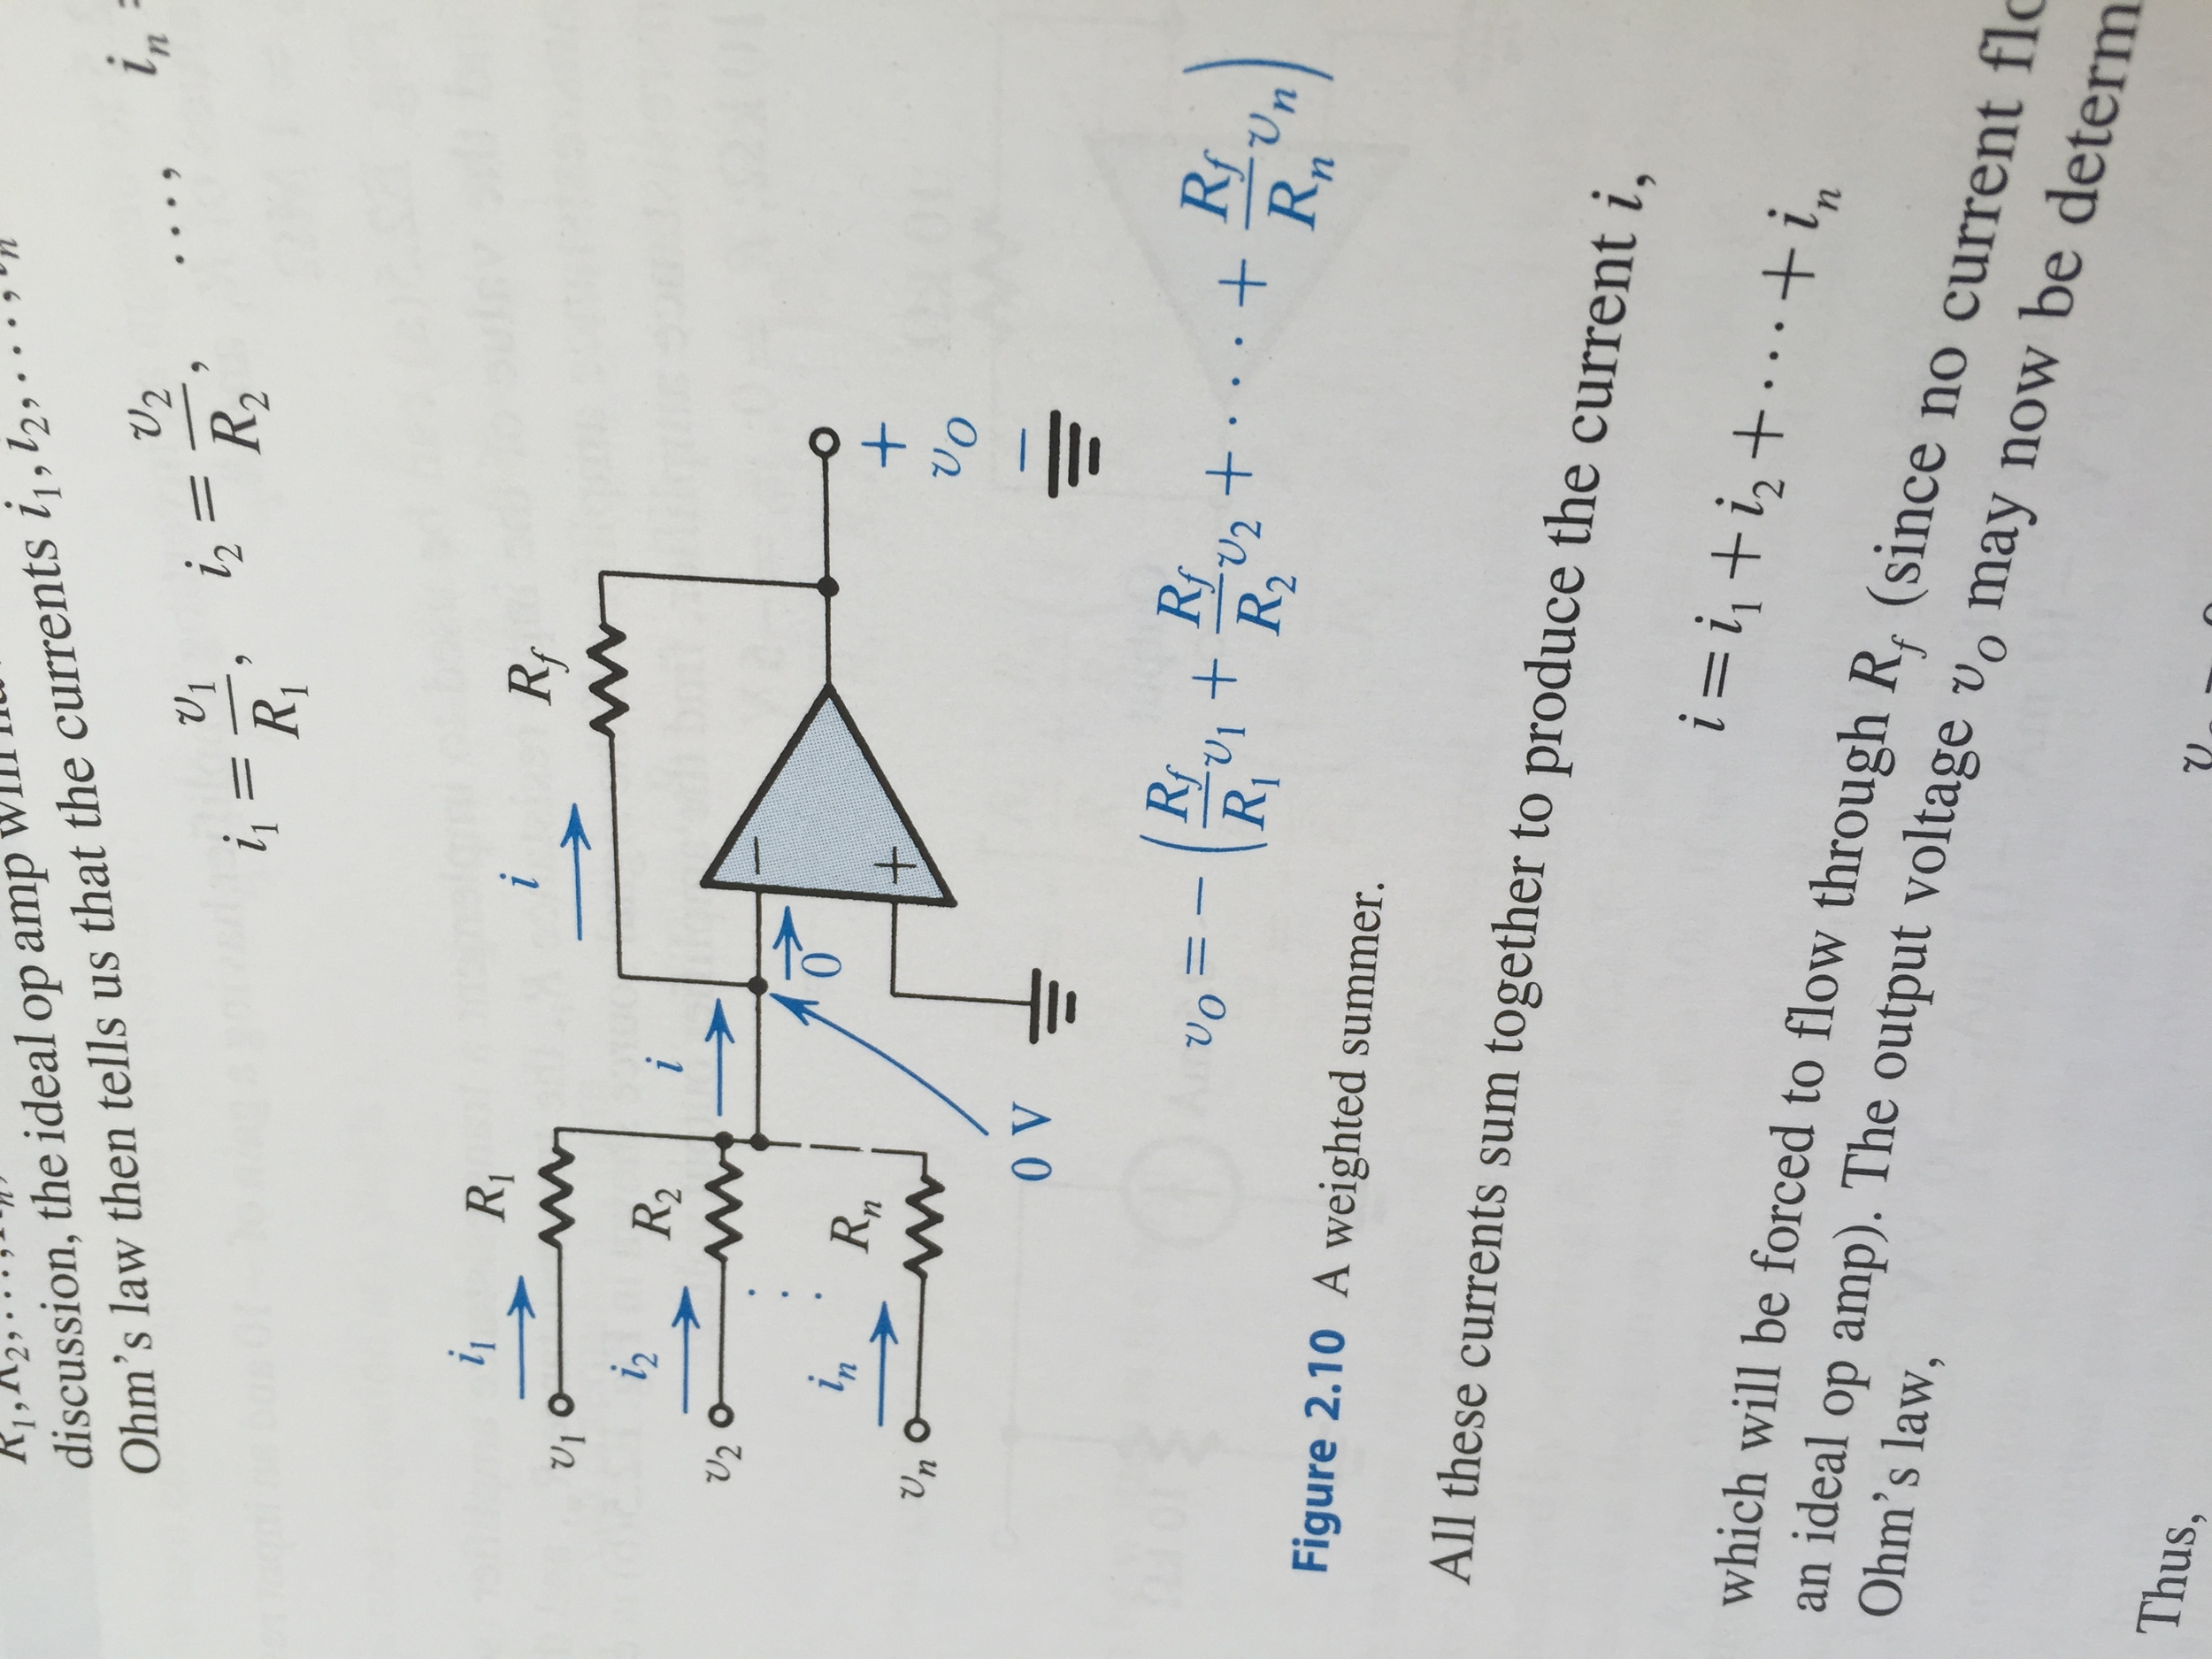 Using A Sheme From Figure 210 Design An Op Amp C